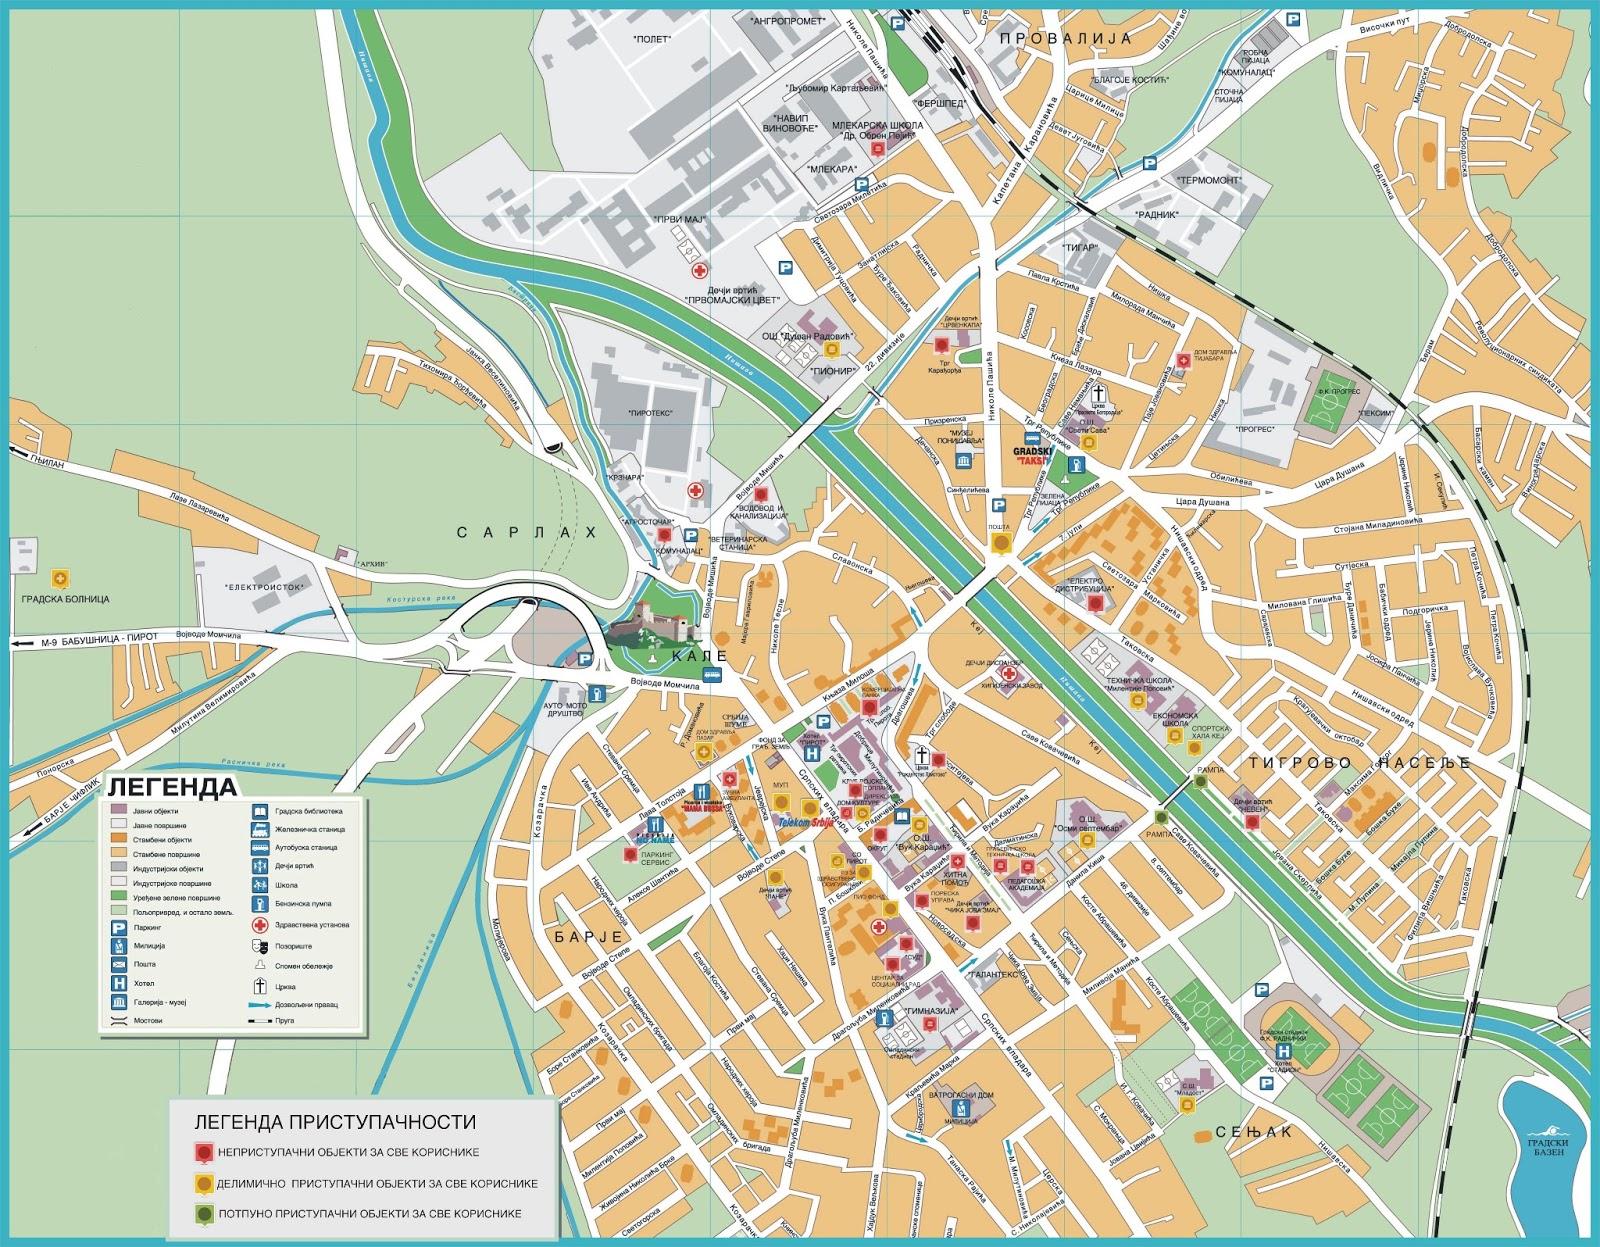 pirot mapa Udruženje osoba sa hendikepom